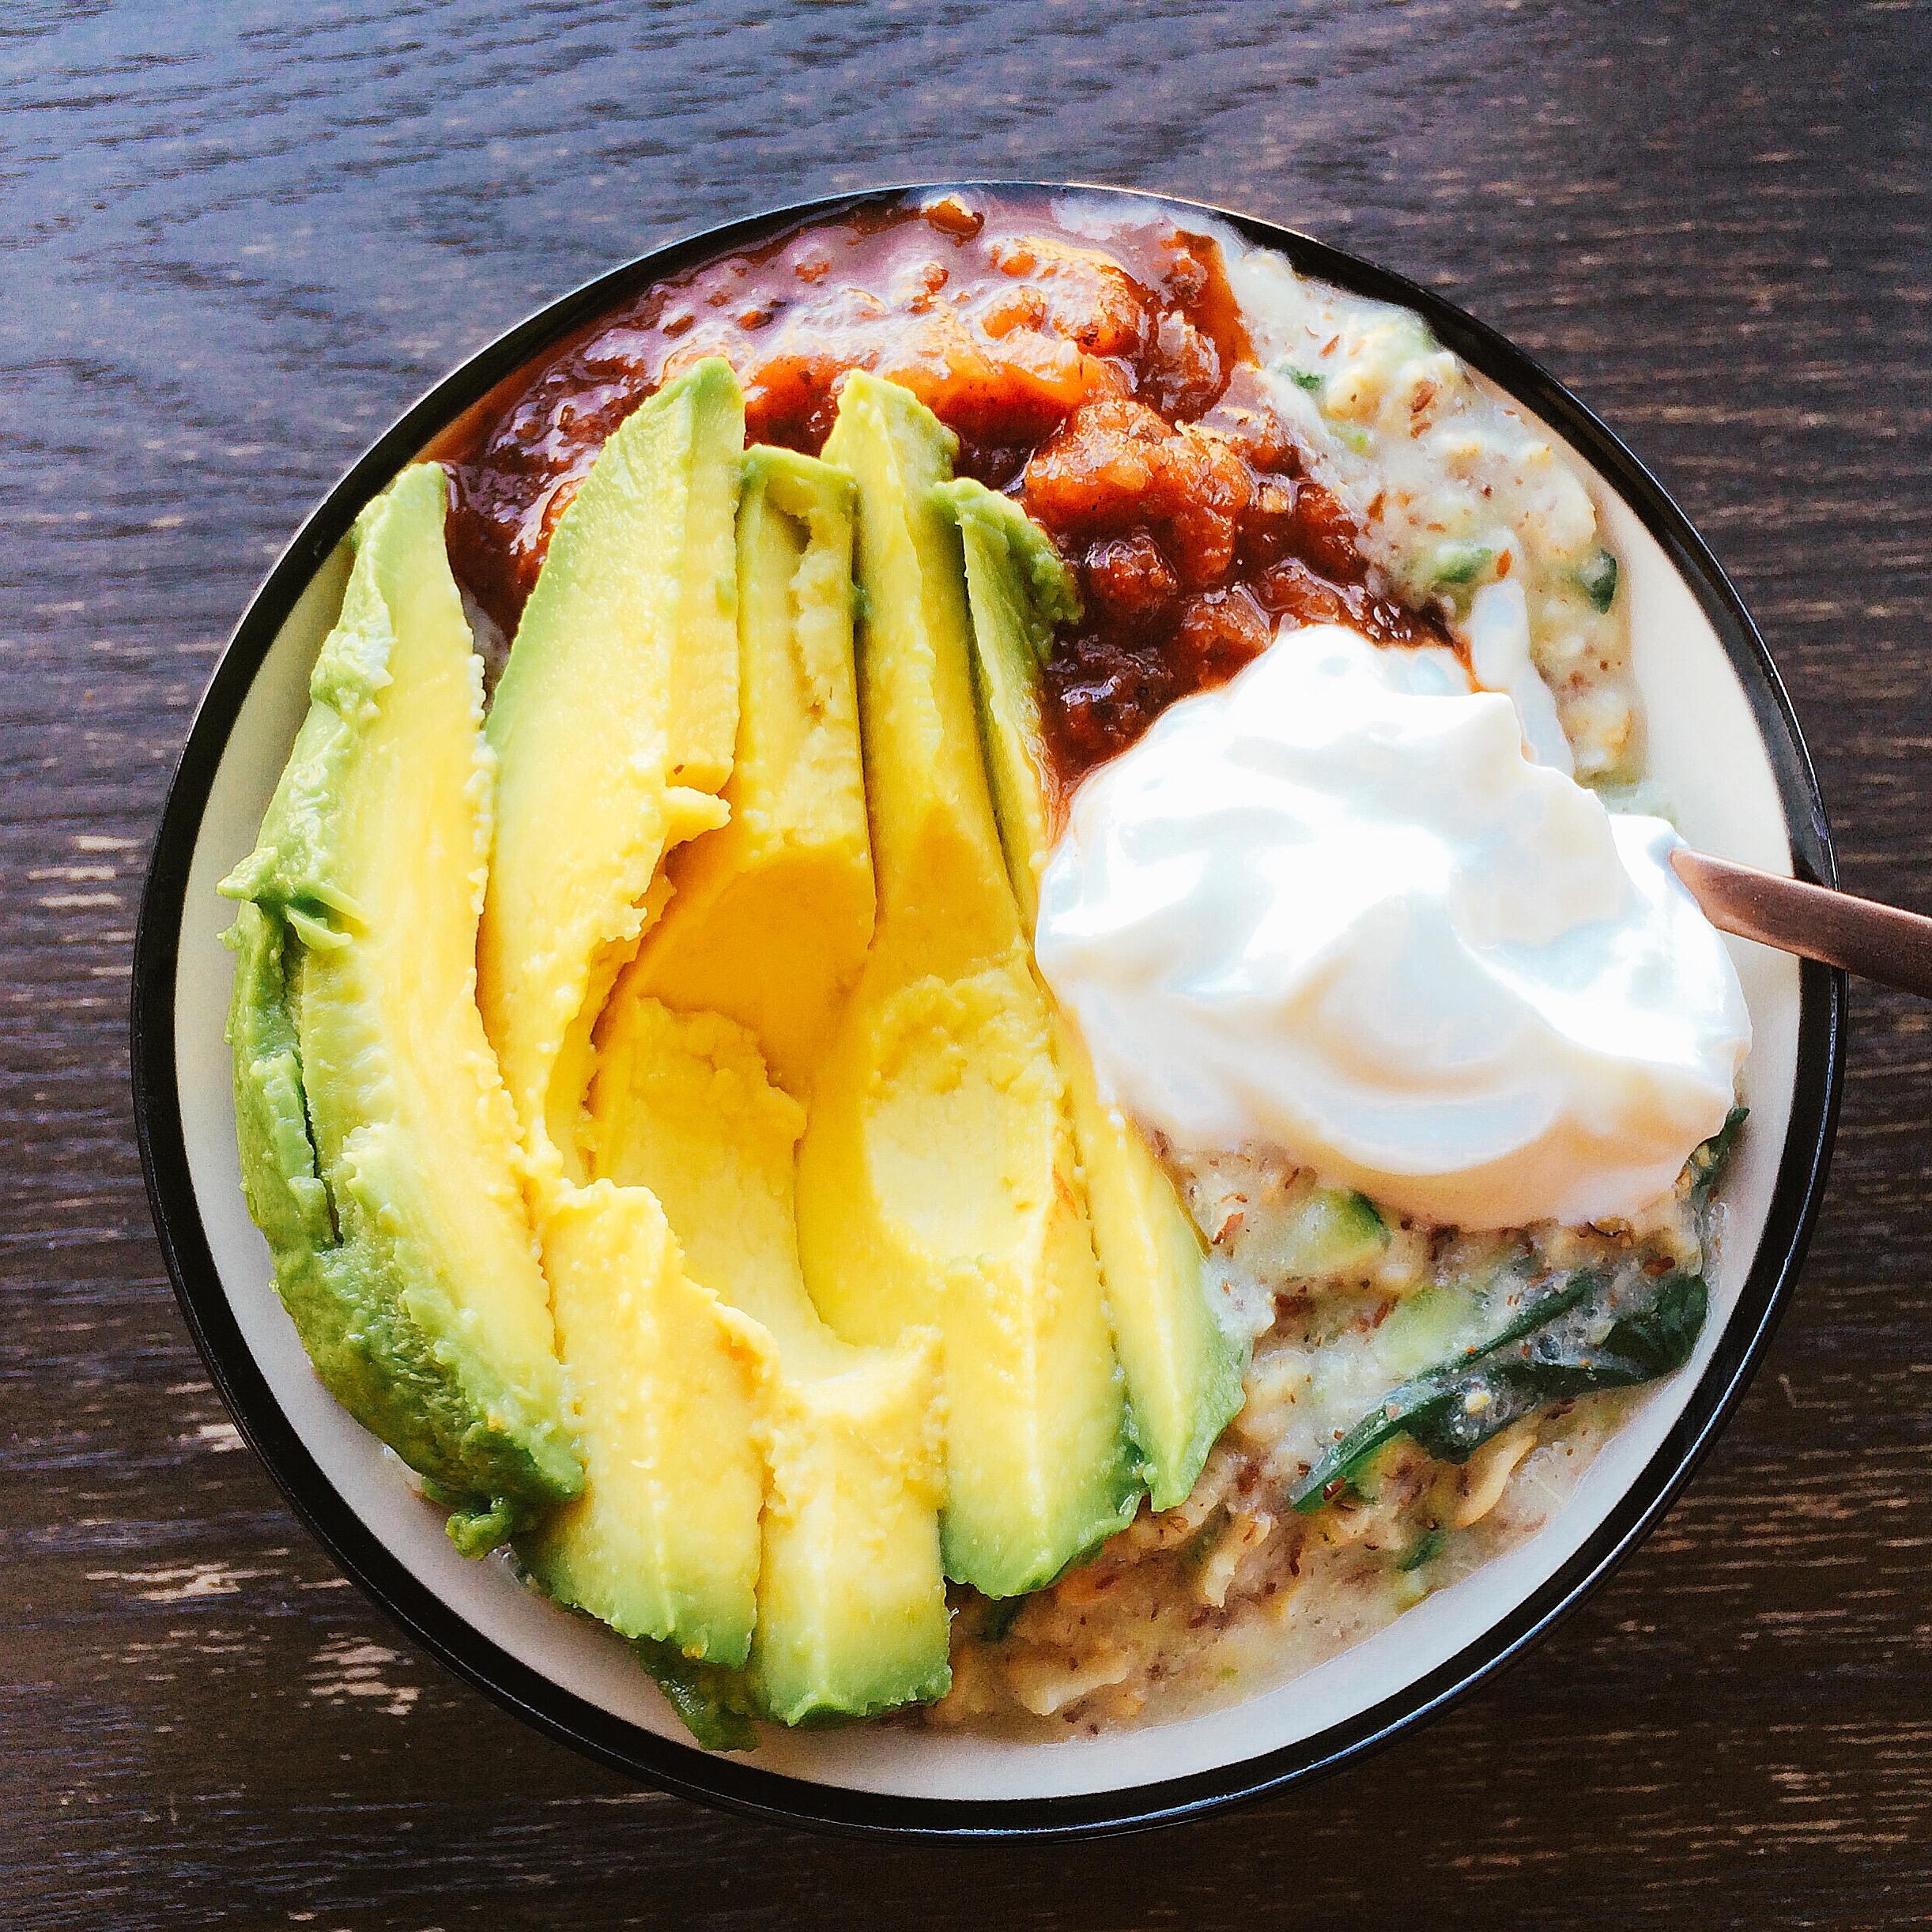 Heart-Healthy Taco Oatmeal